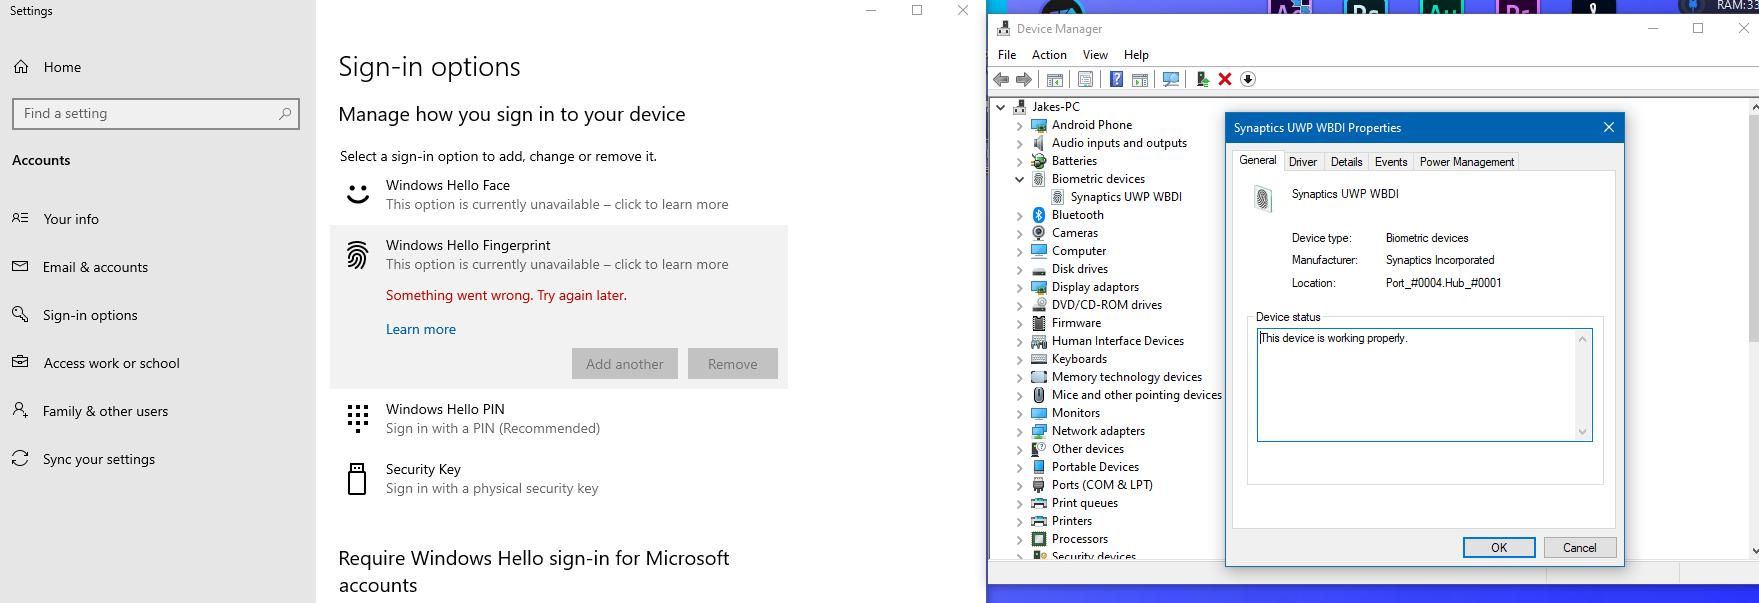 Laptop fingerprint not working . a04f9cc9-ebff-4ca5-9dd6-5595377827fb?upload=true.png